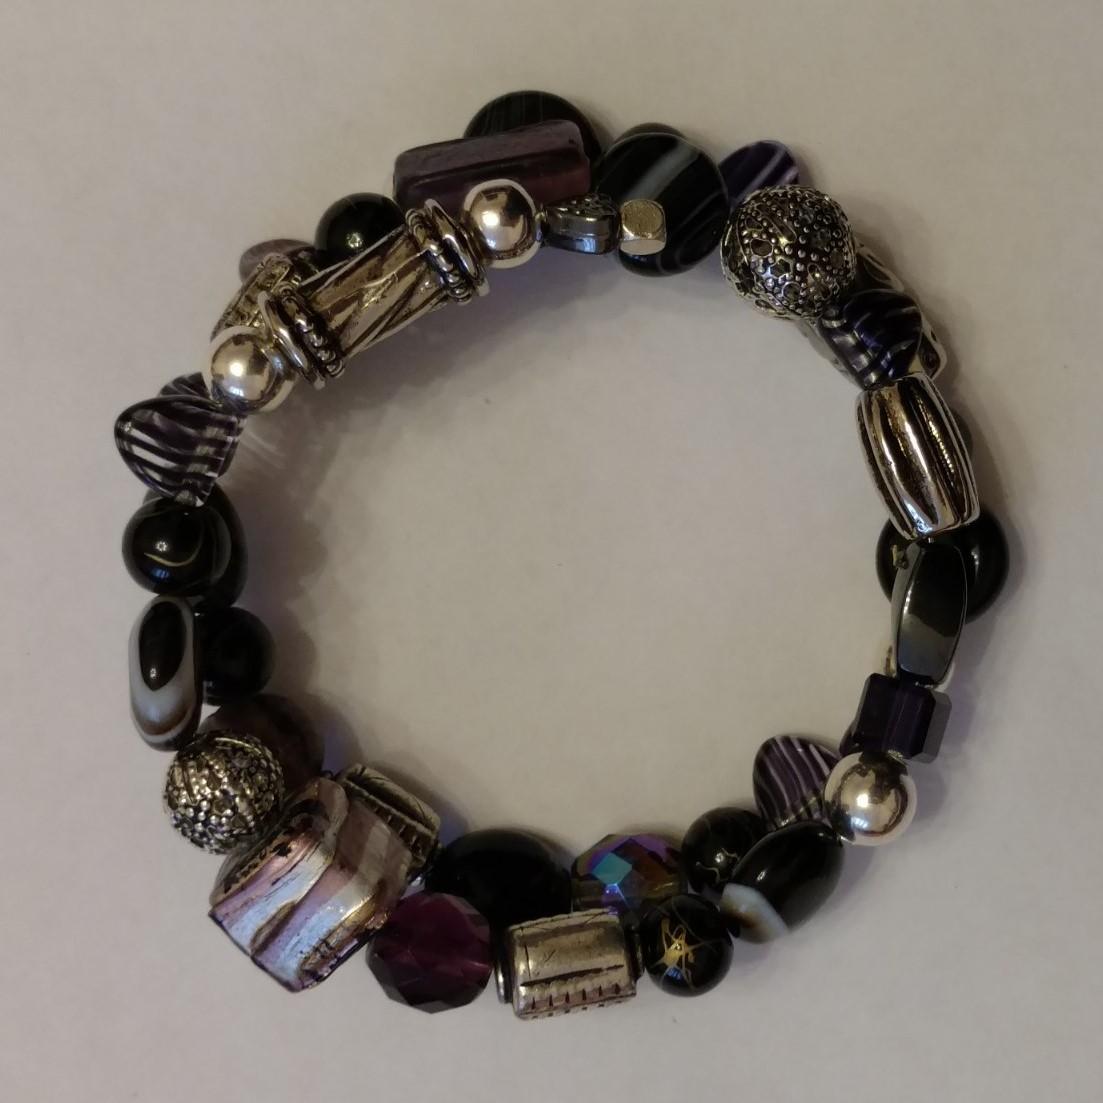 #L&L 181227 Bracelet  Suggested $25 USD